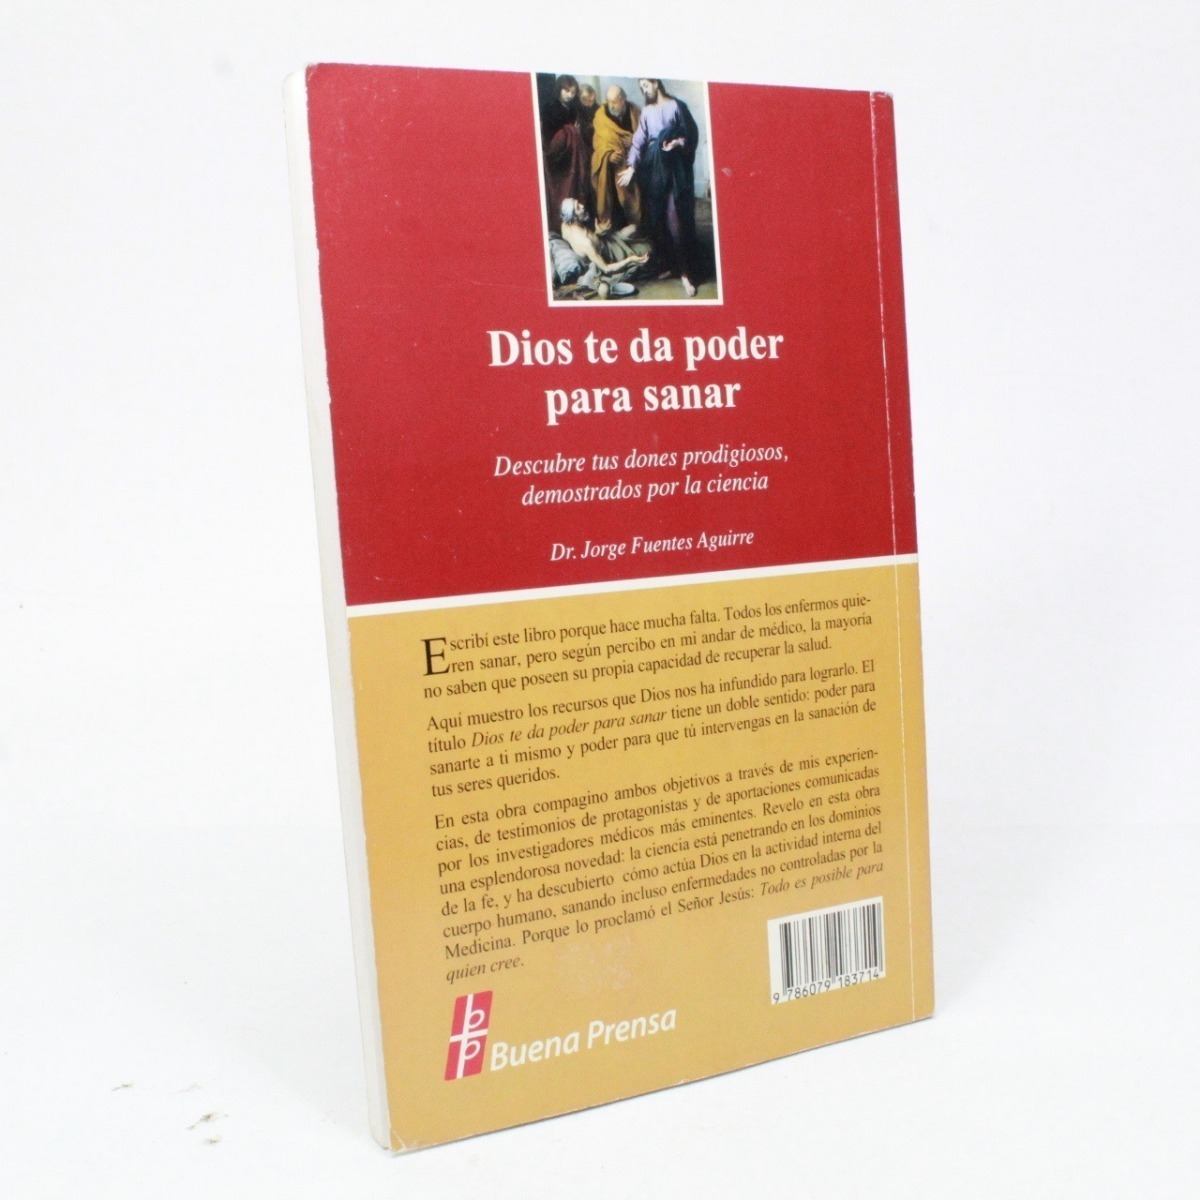 Dios Te Da Poder Para Sanar Dr Jorge Fuentes Aguirre R7 - $ 1,000 00